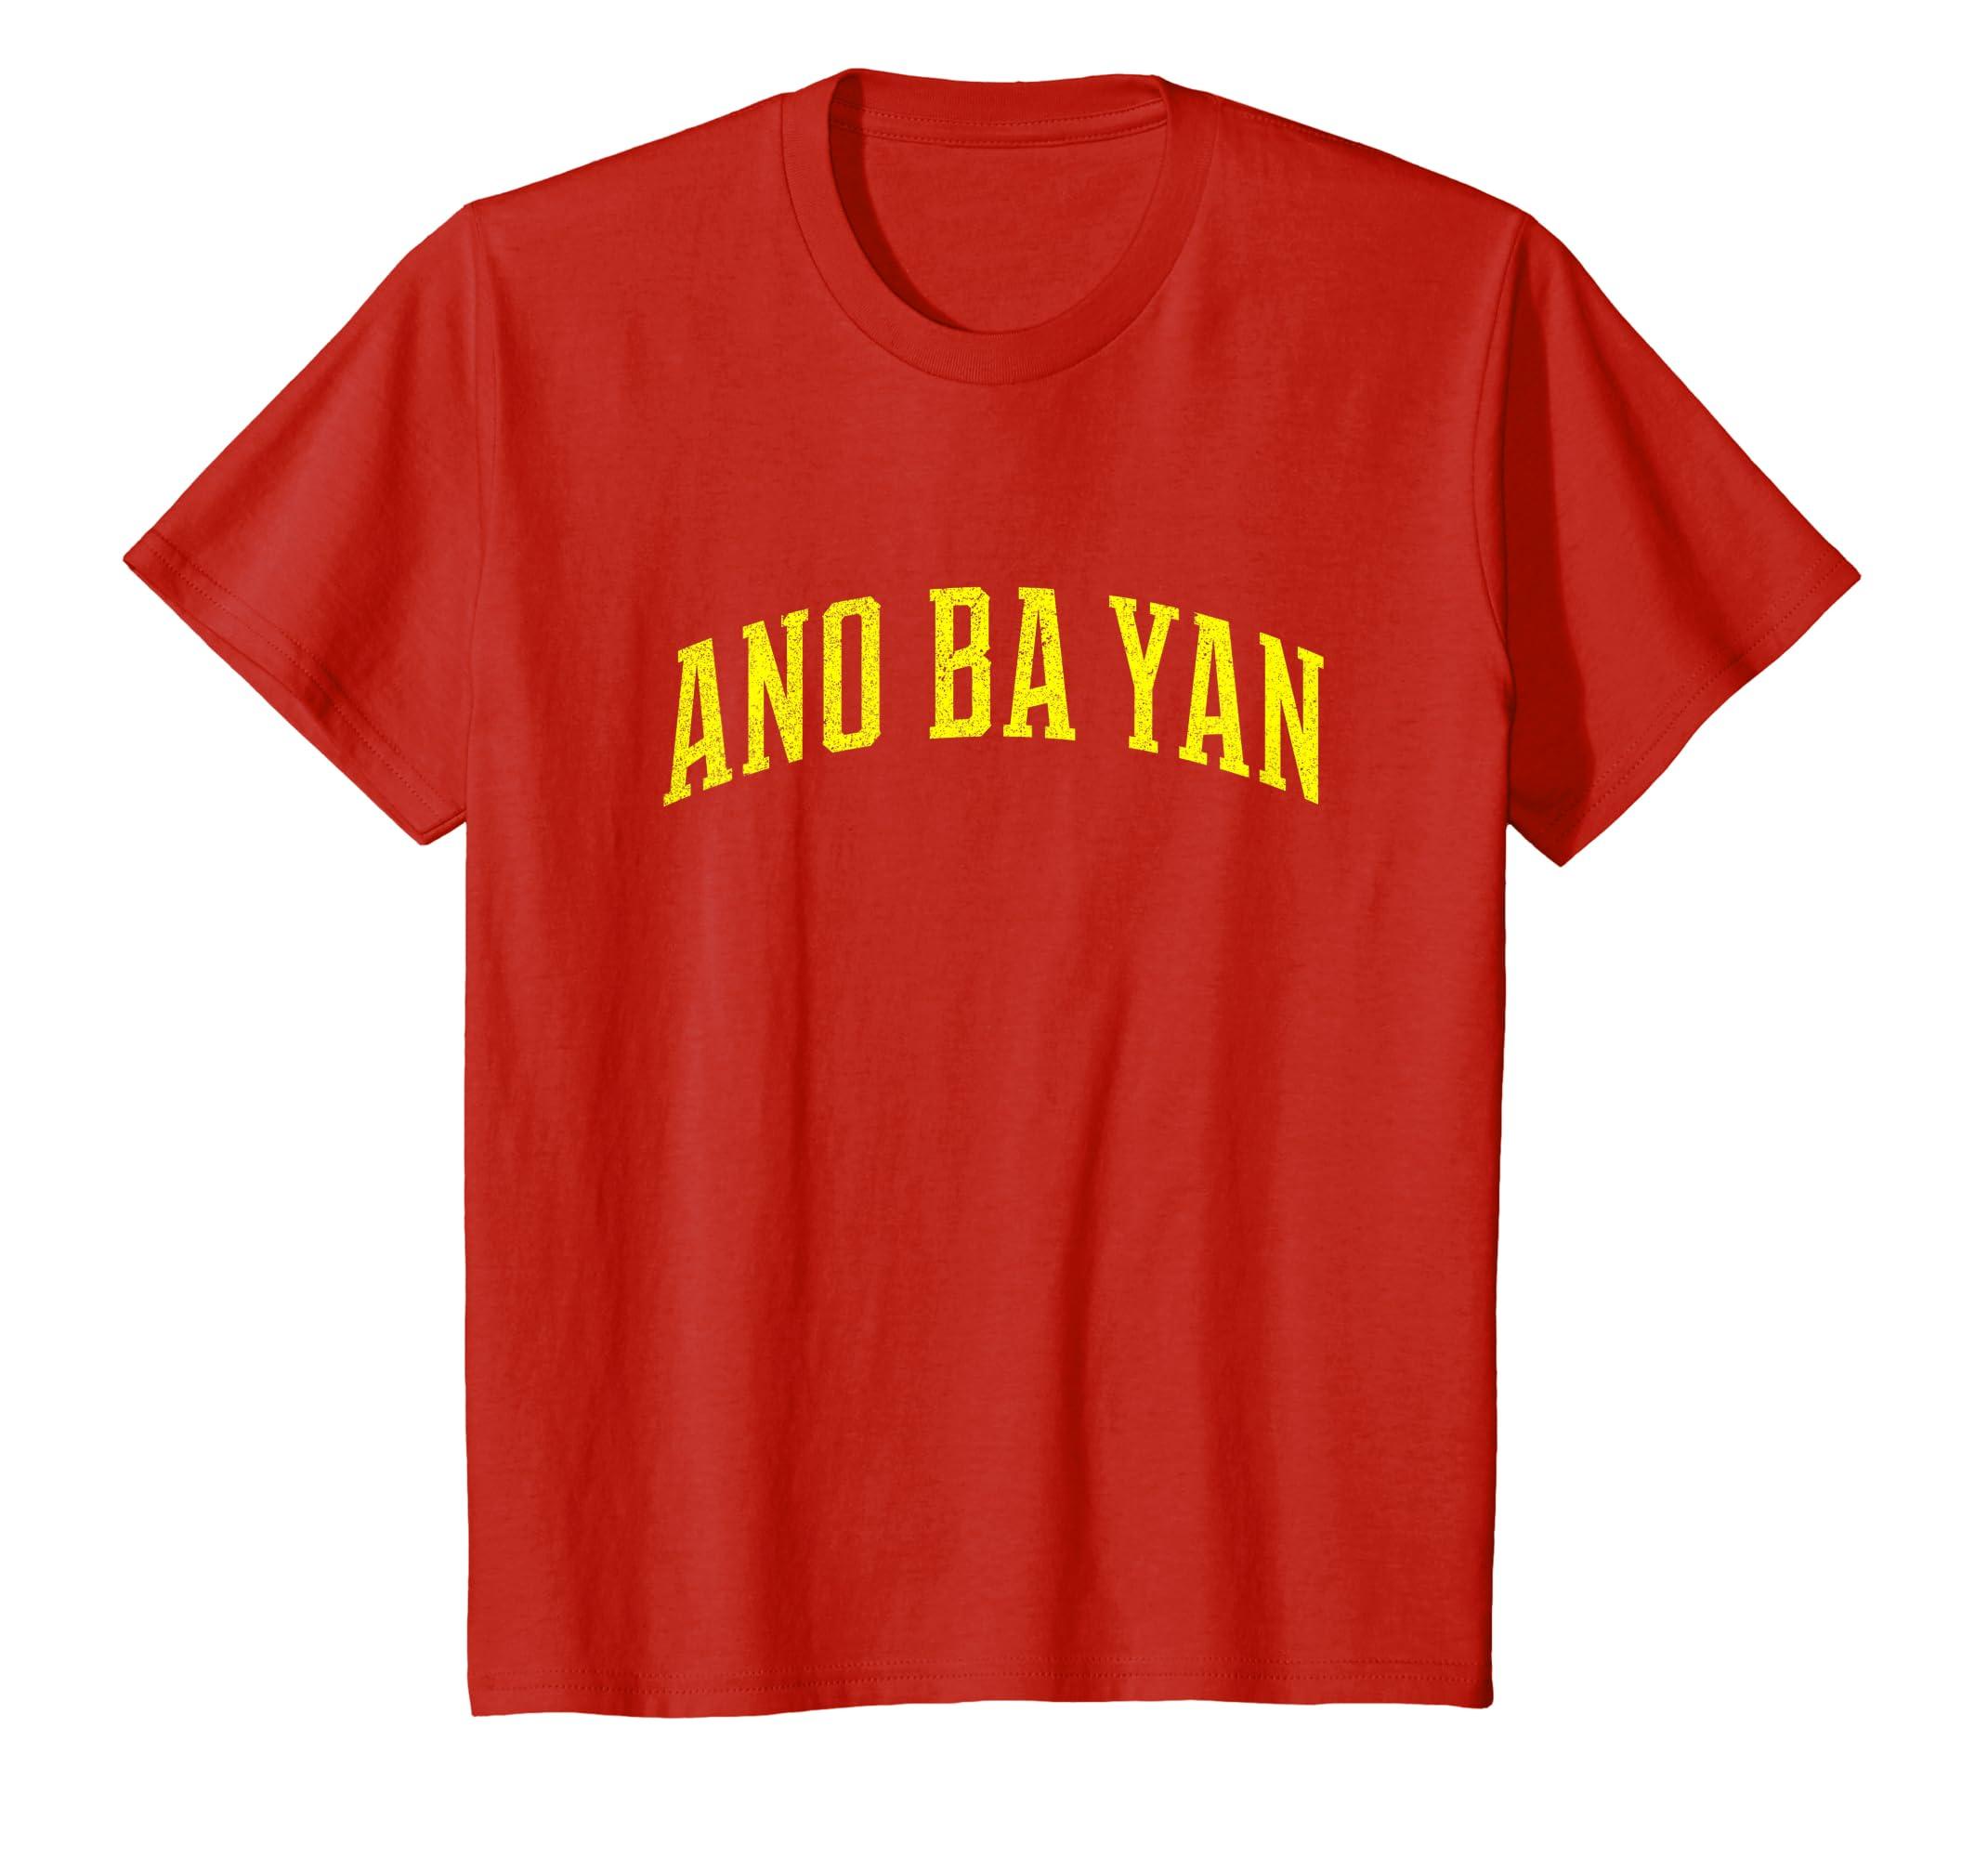 Amazoncom Ano Ba Yan Philippines Filipino Tagalog T Shirt